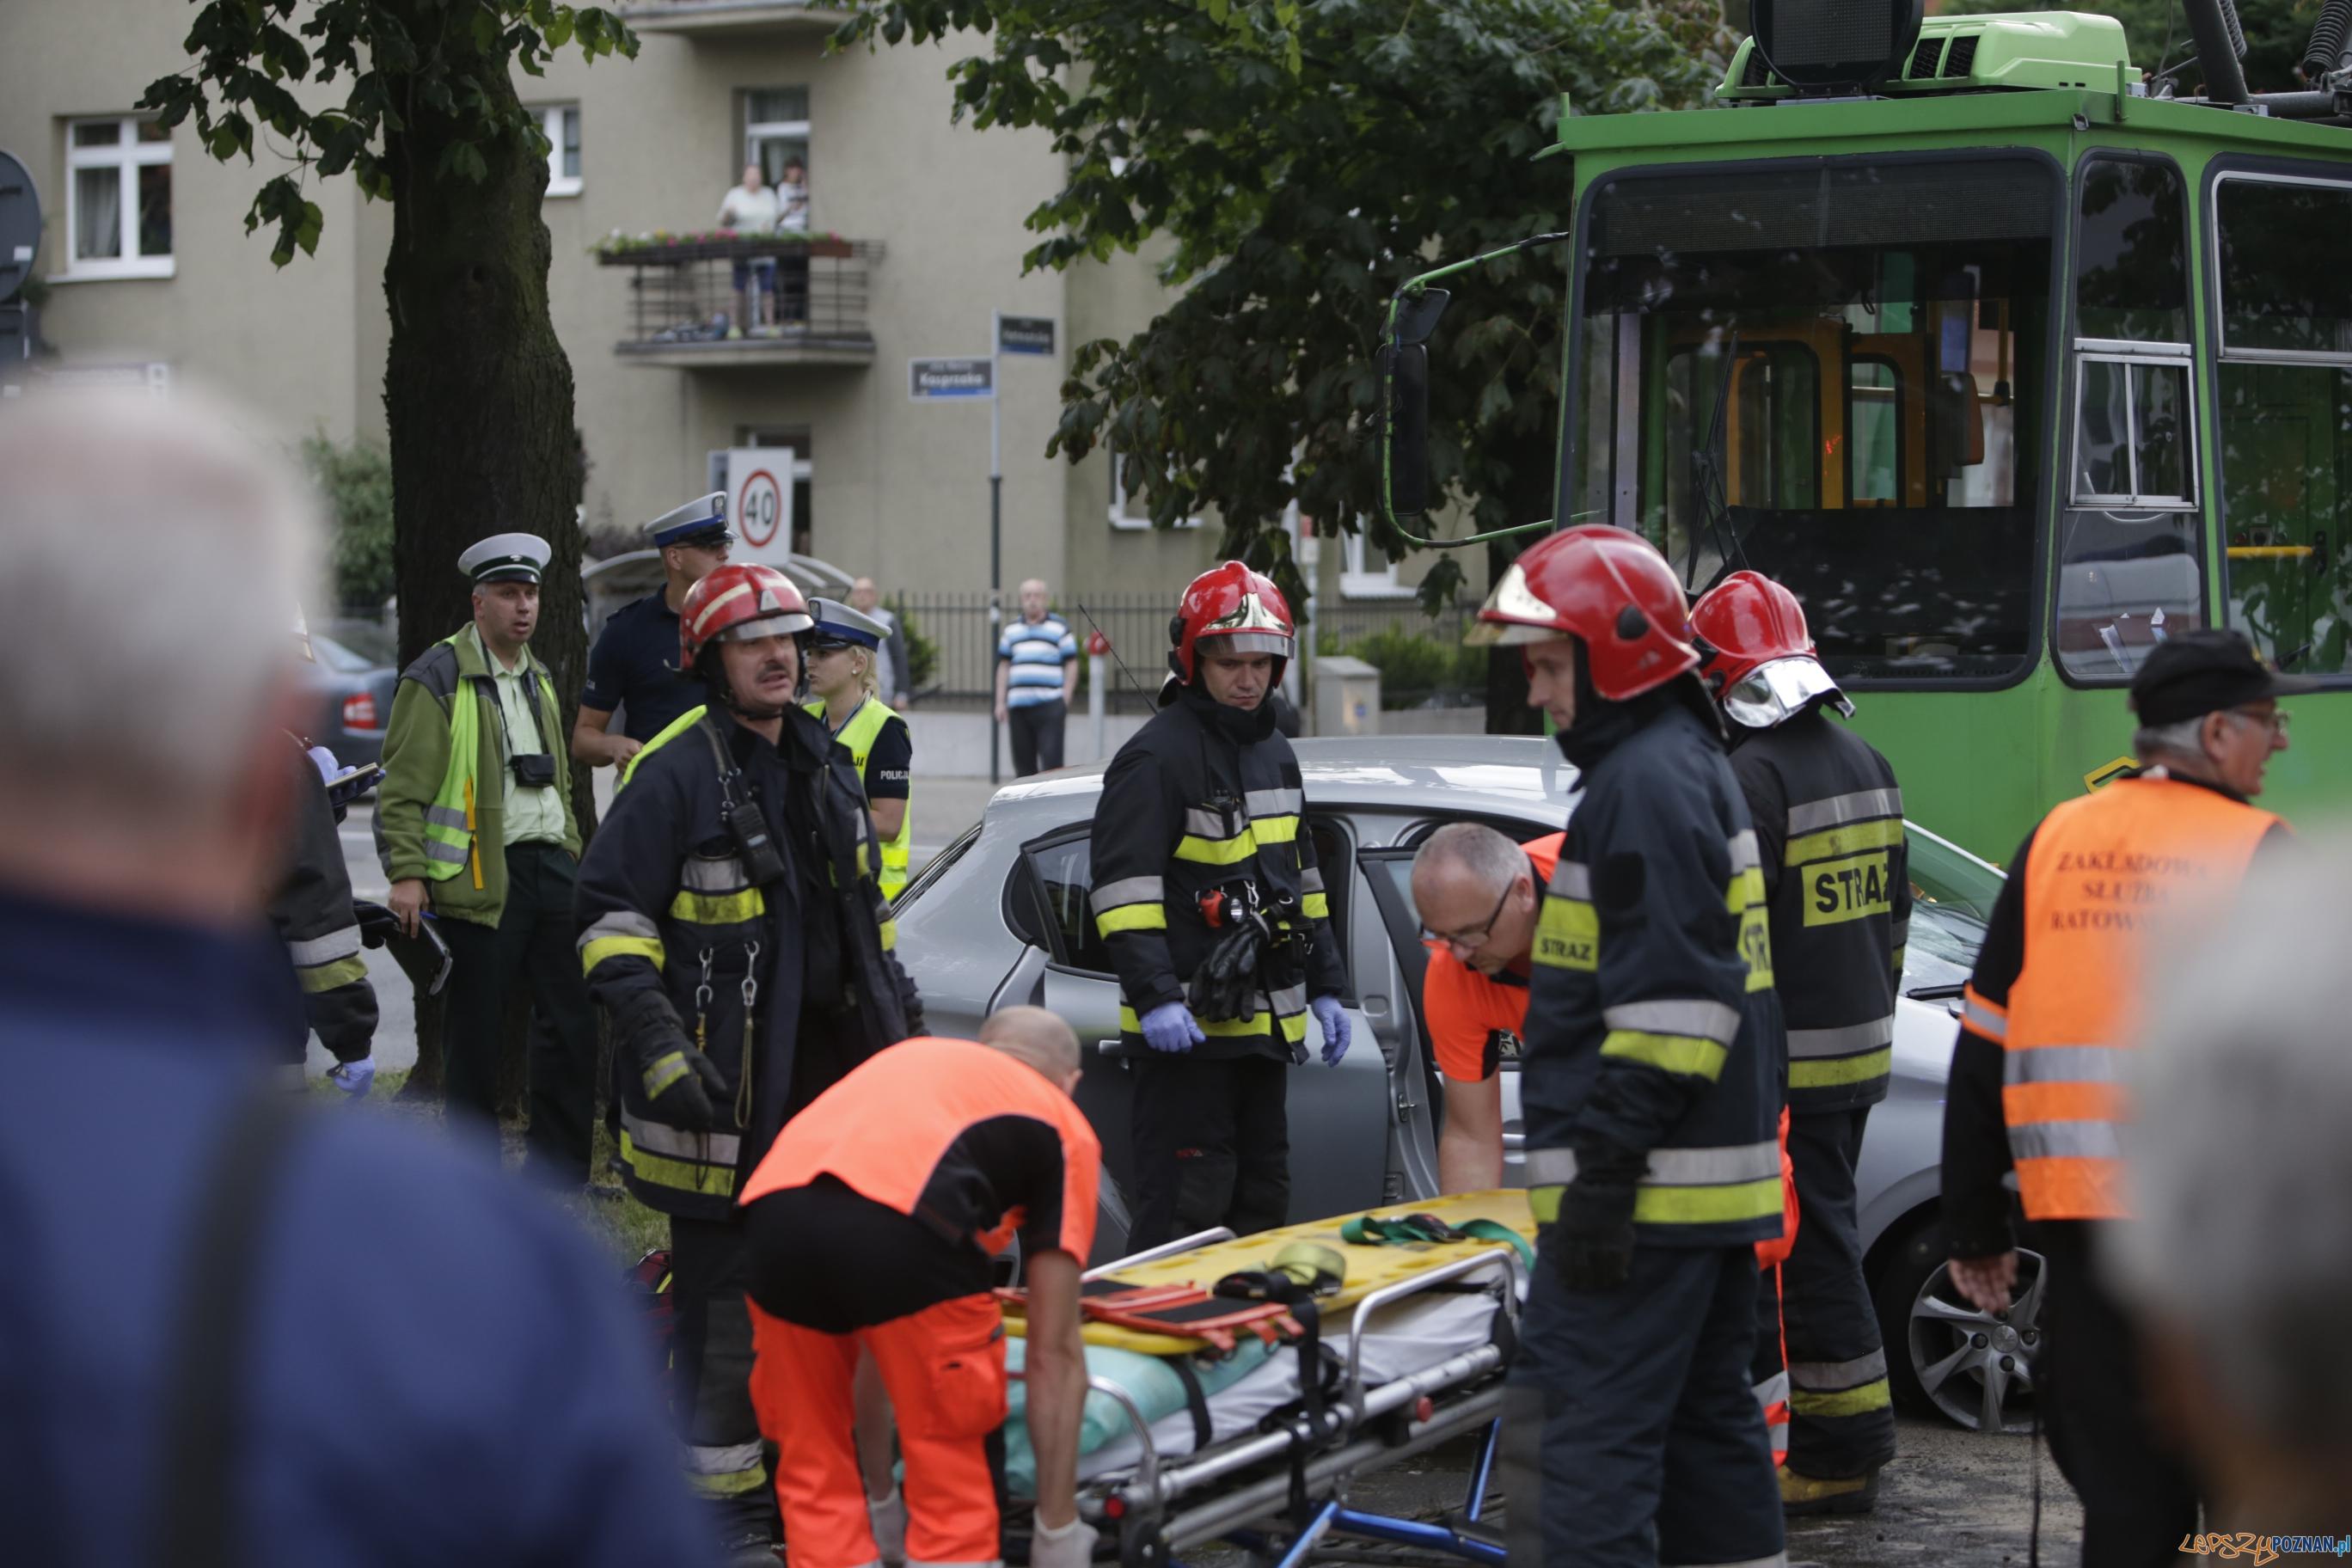 Wypadek Kasprzaka/Hetmańska  Foto: lepszyPOZNAN.pl / Piotr Rychter